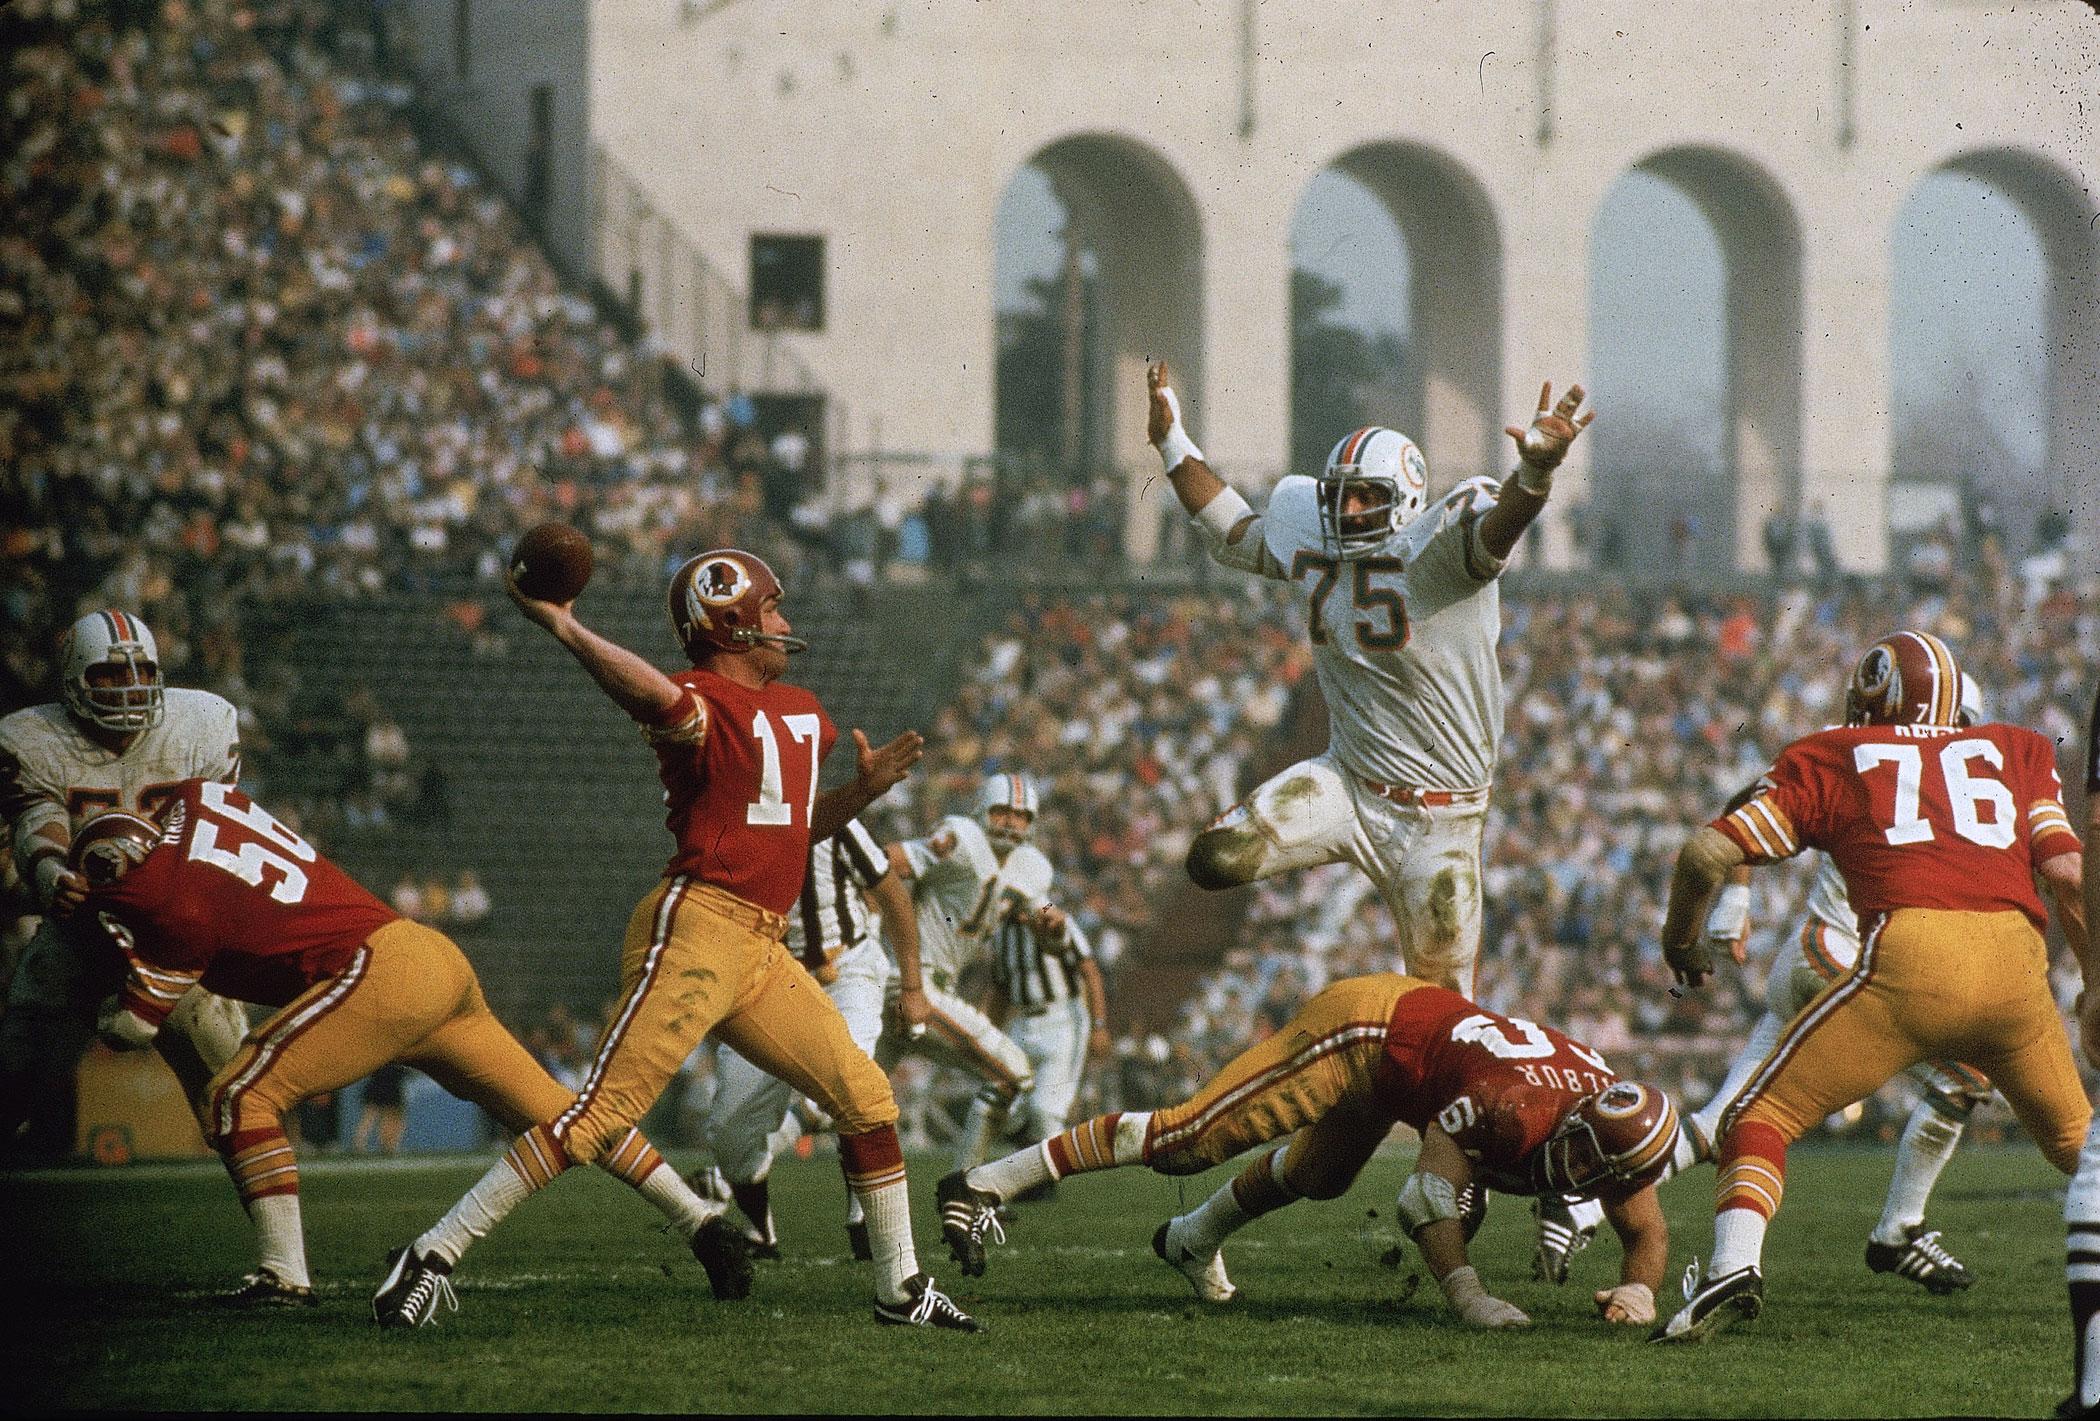 Super Bowl VII, Jan. 14, 1973                               Miami Dolphins vs Washington Redskins in Los Angeles